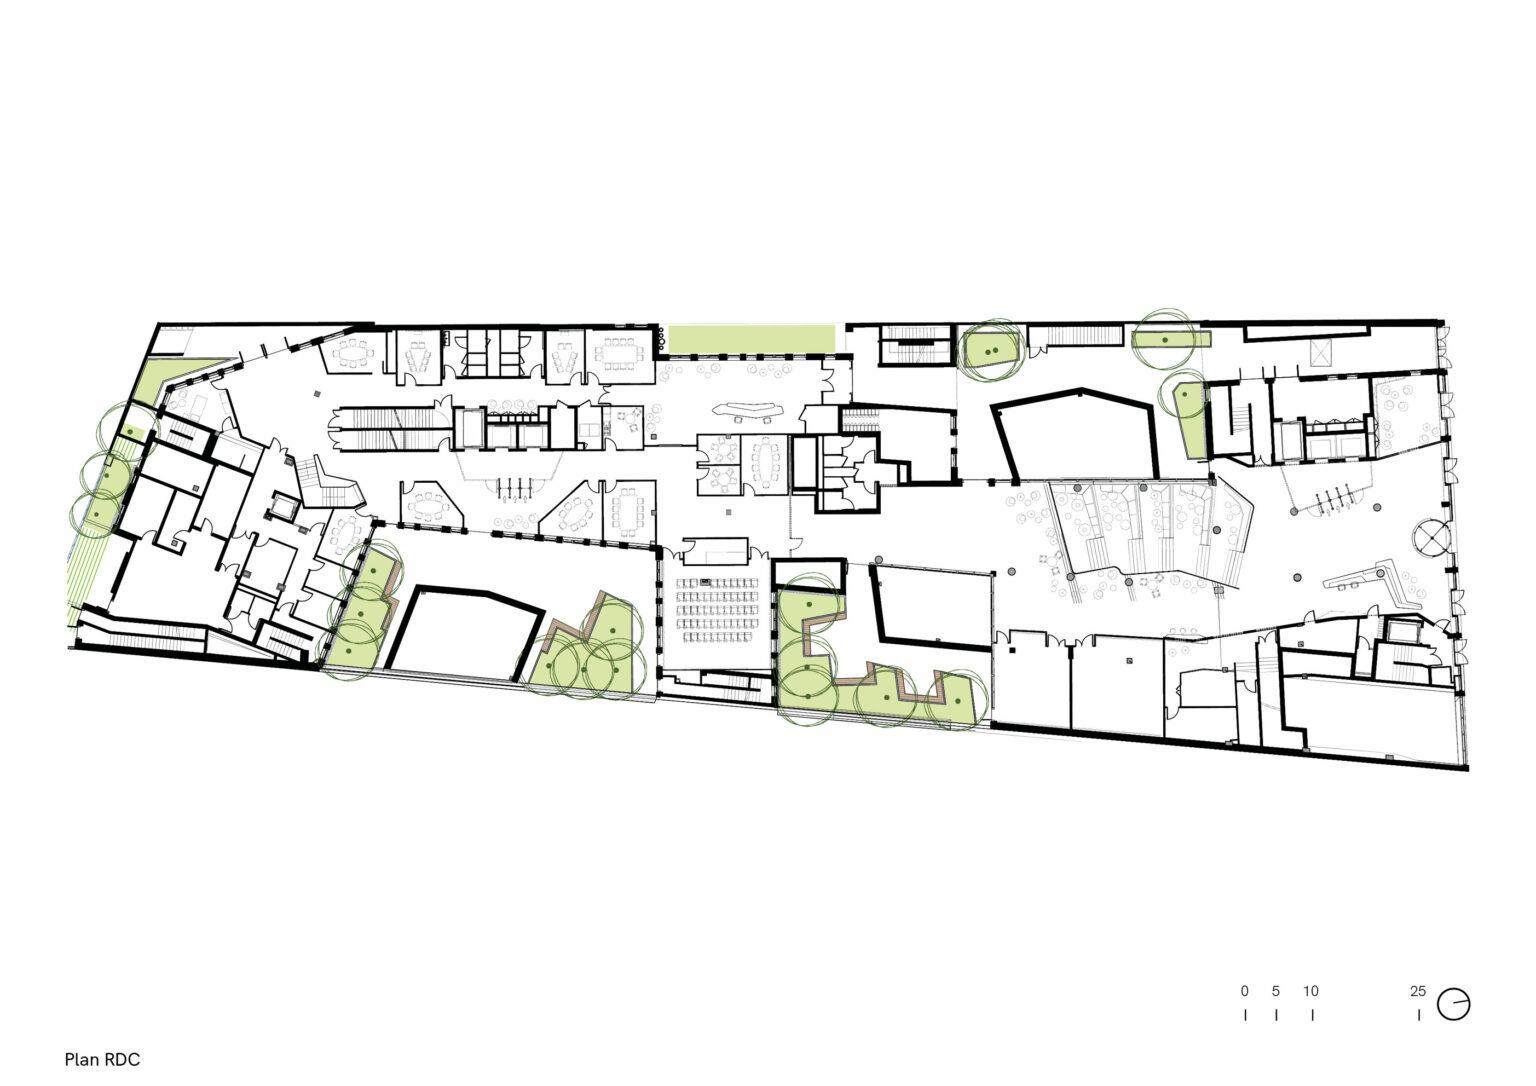 185 avenue Charles de Gaulle, Neuilly, plan rdc